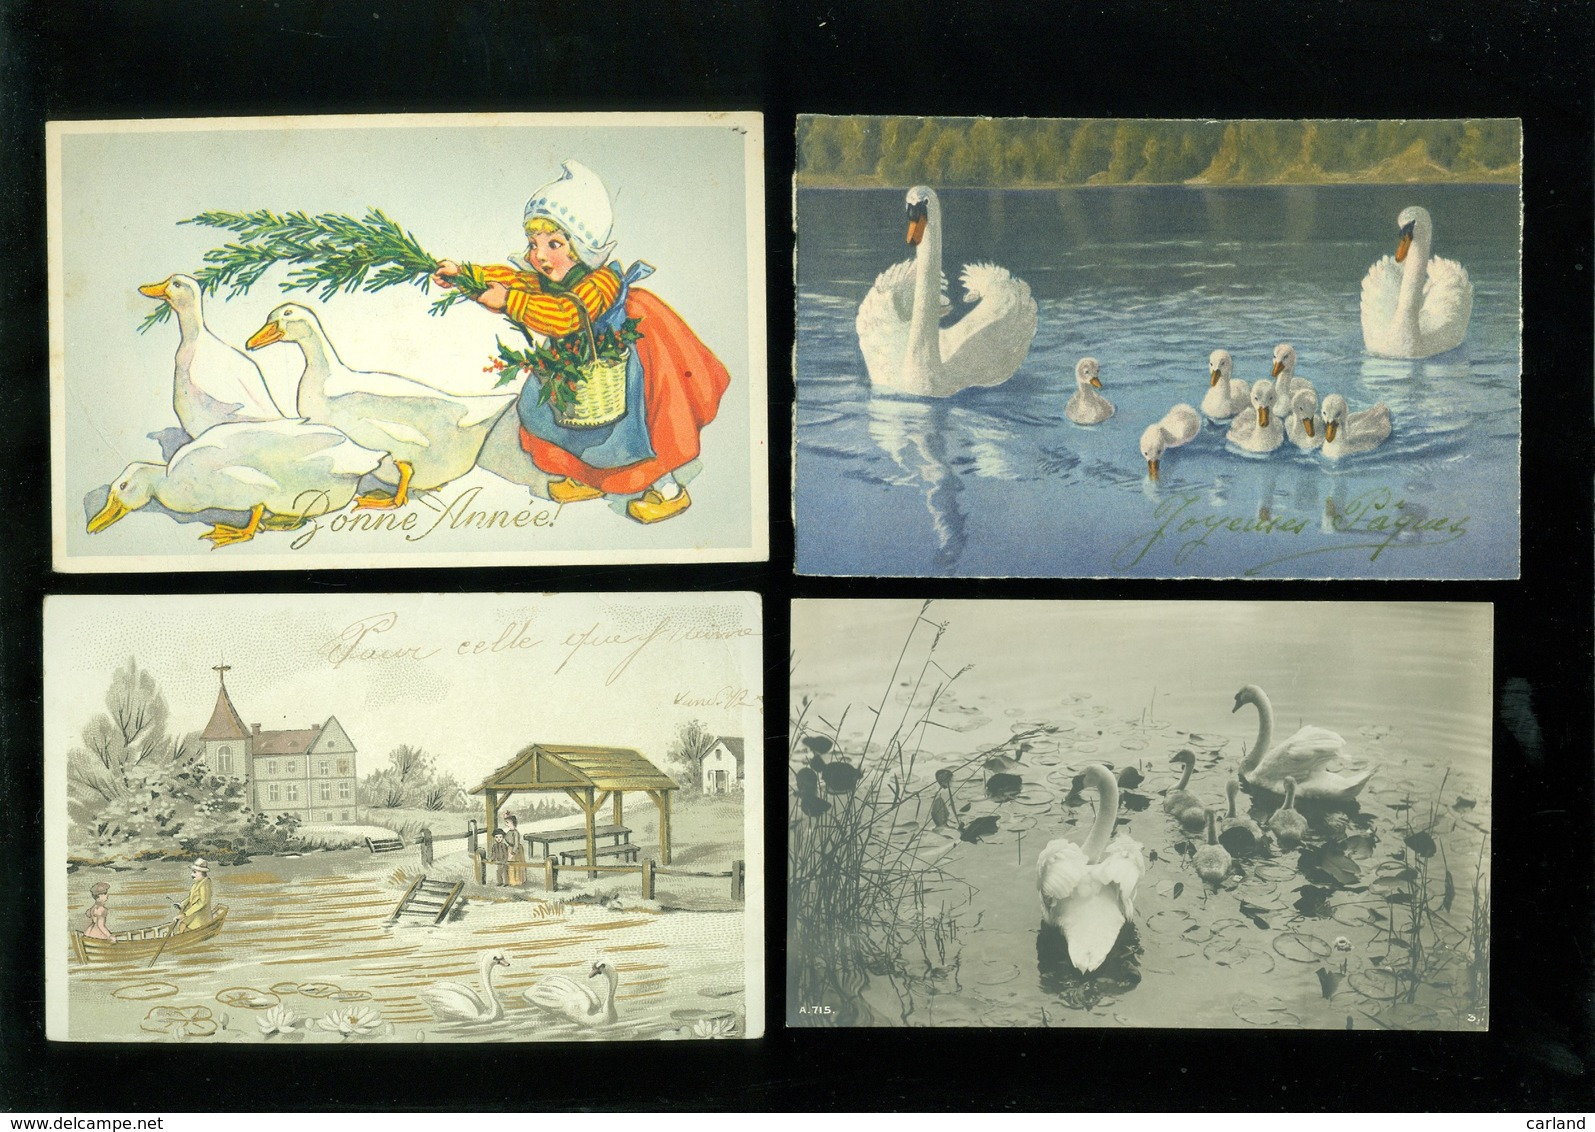 Beau Lot De 20 Cartes Postales De Fantaisie  Cygne  Cygnes   Mooi Lot Van 20 Postkaarten Van Fantasie  Zwaan  Zwanen - Cartes Postales